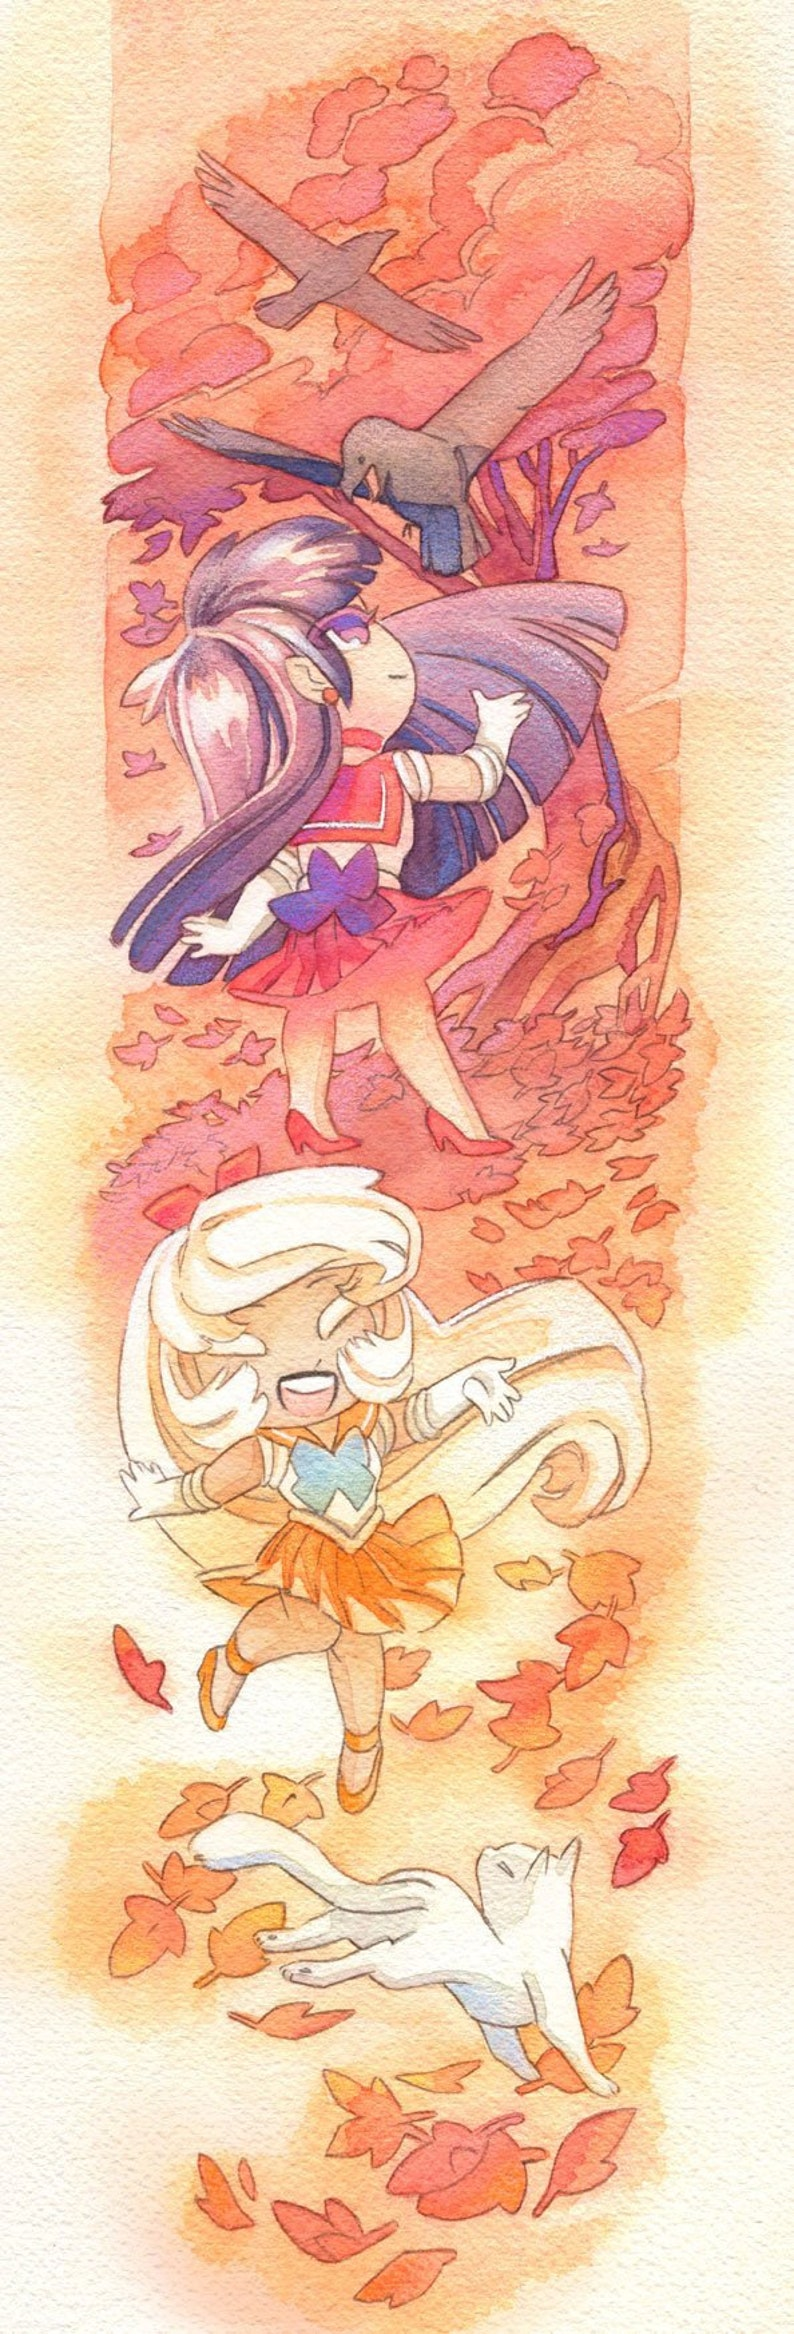 Sailor Moon Poster Sailor Mars and Sailor Venus 8x24 Poster image 0